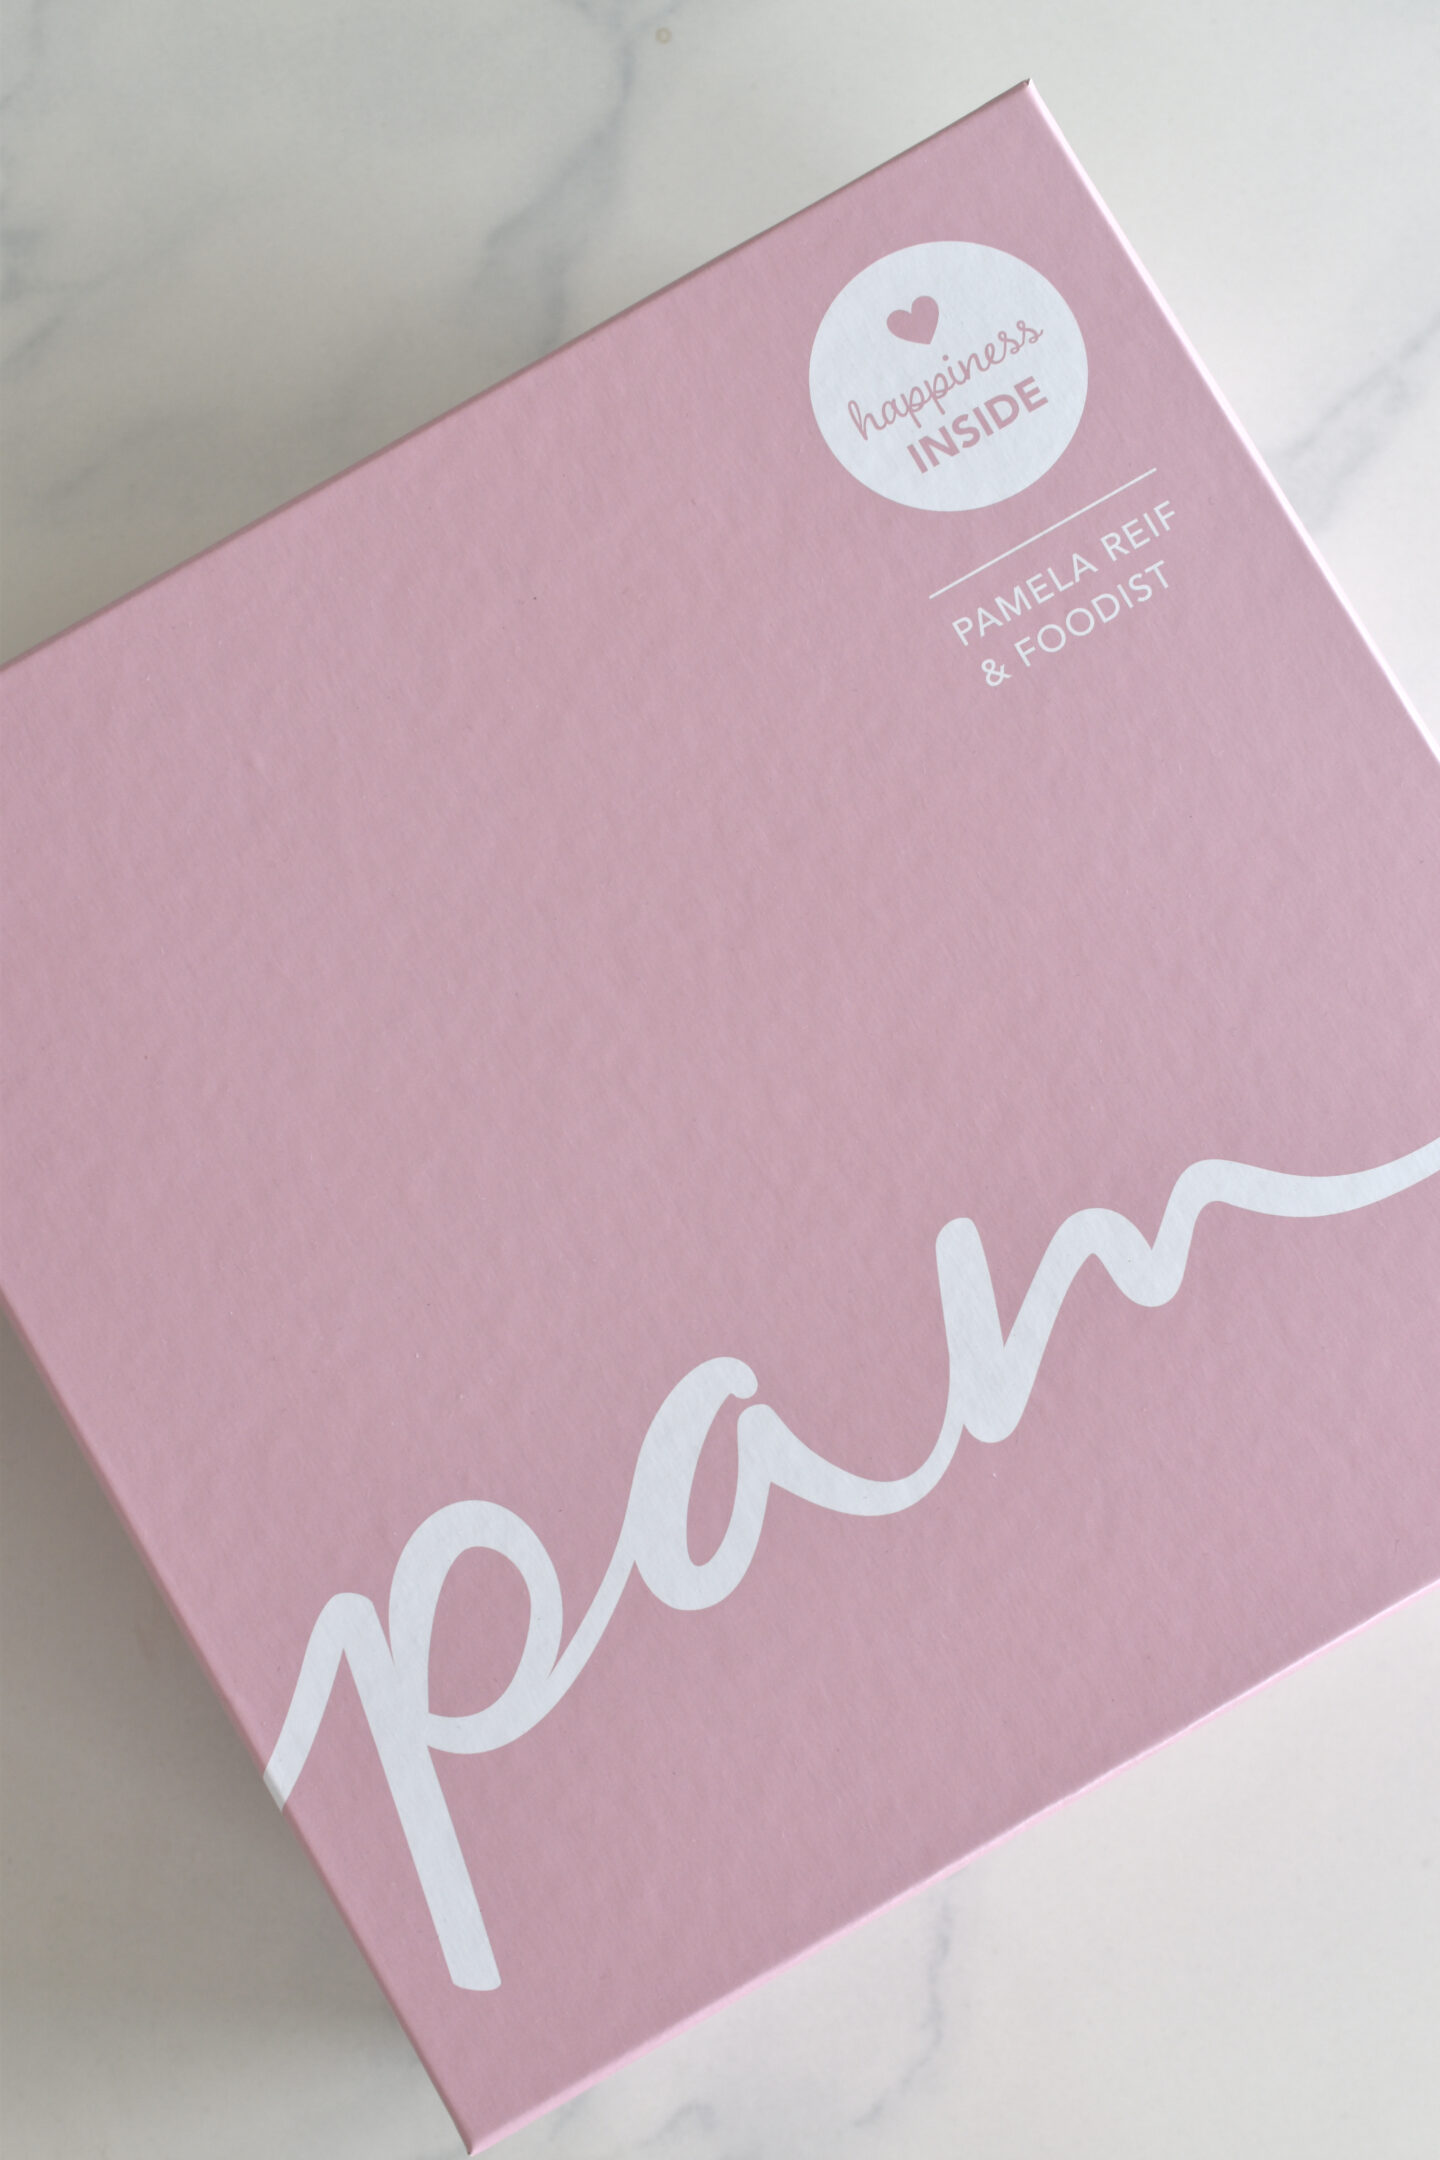 Pam Box August 2020